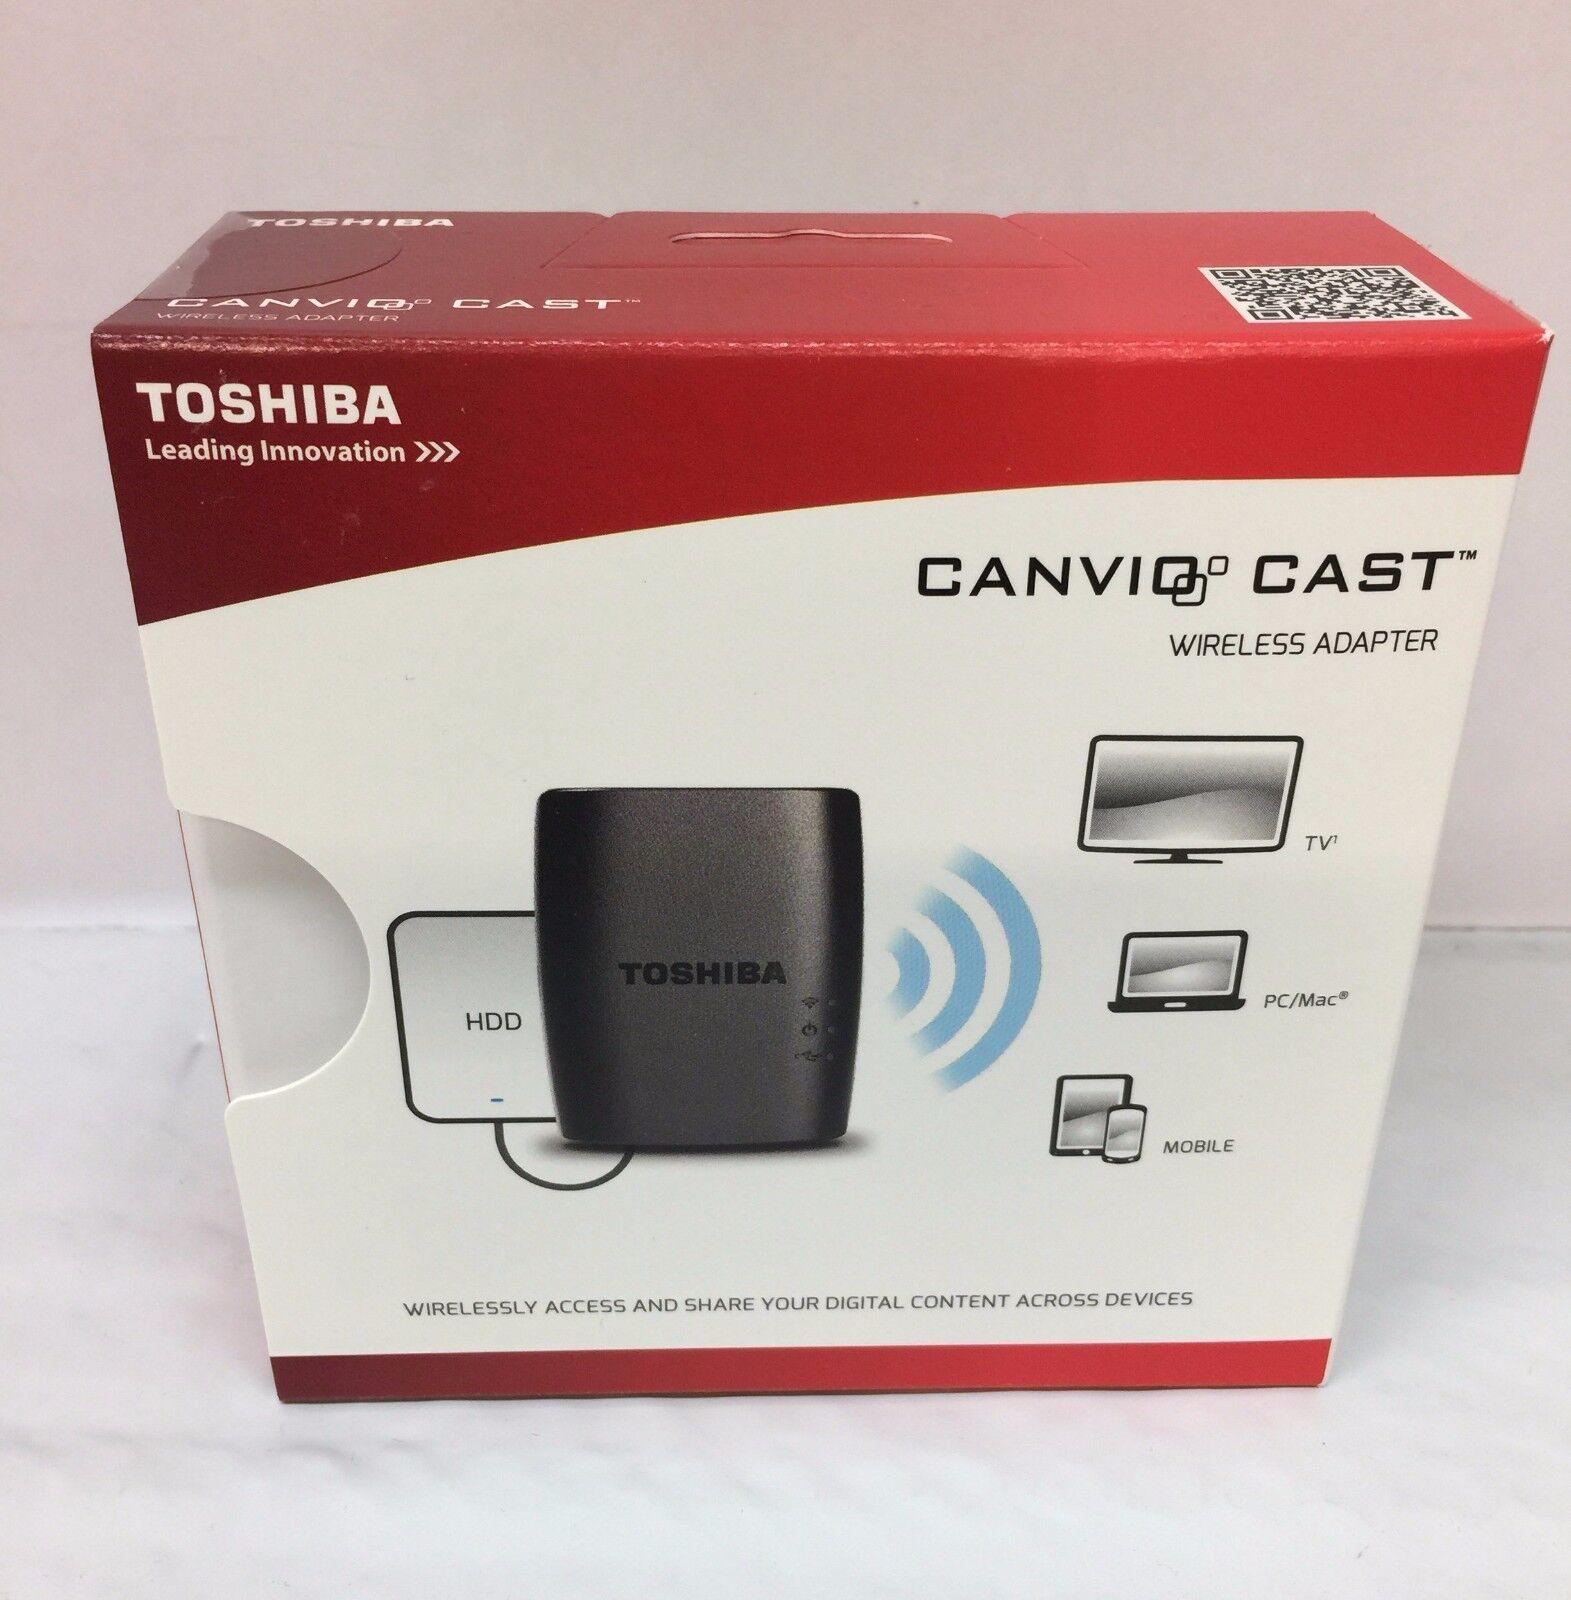 Toshiba Canvio Wireless Adapter for External Hard Drives